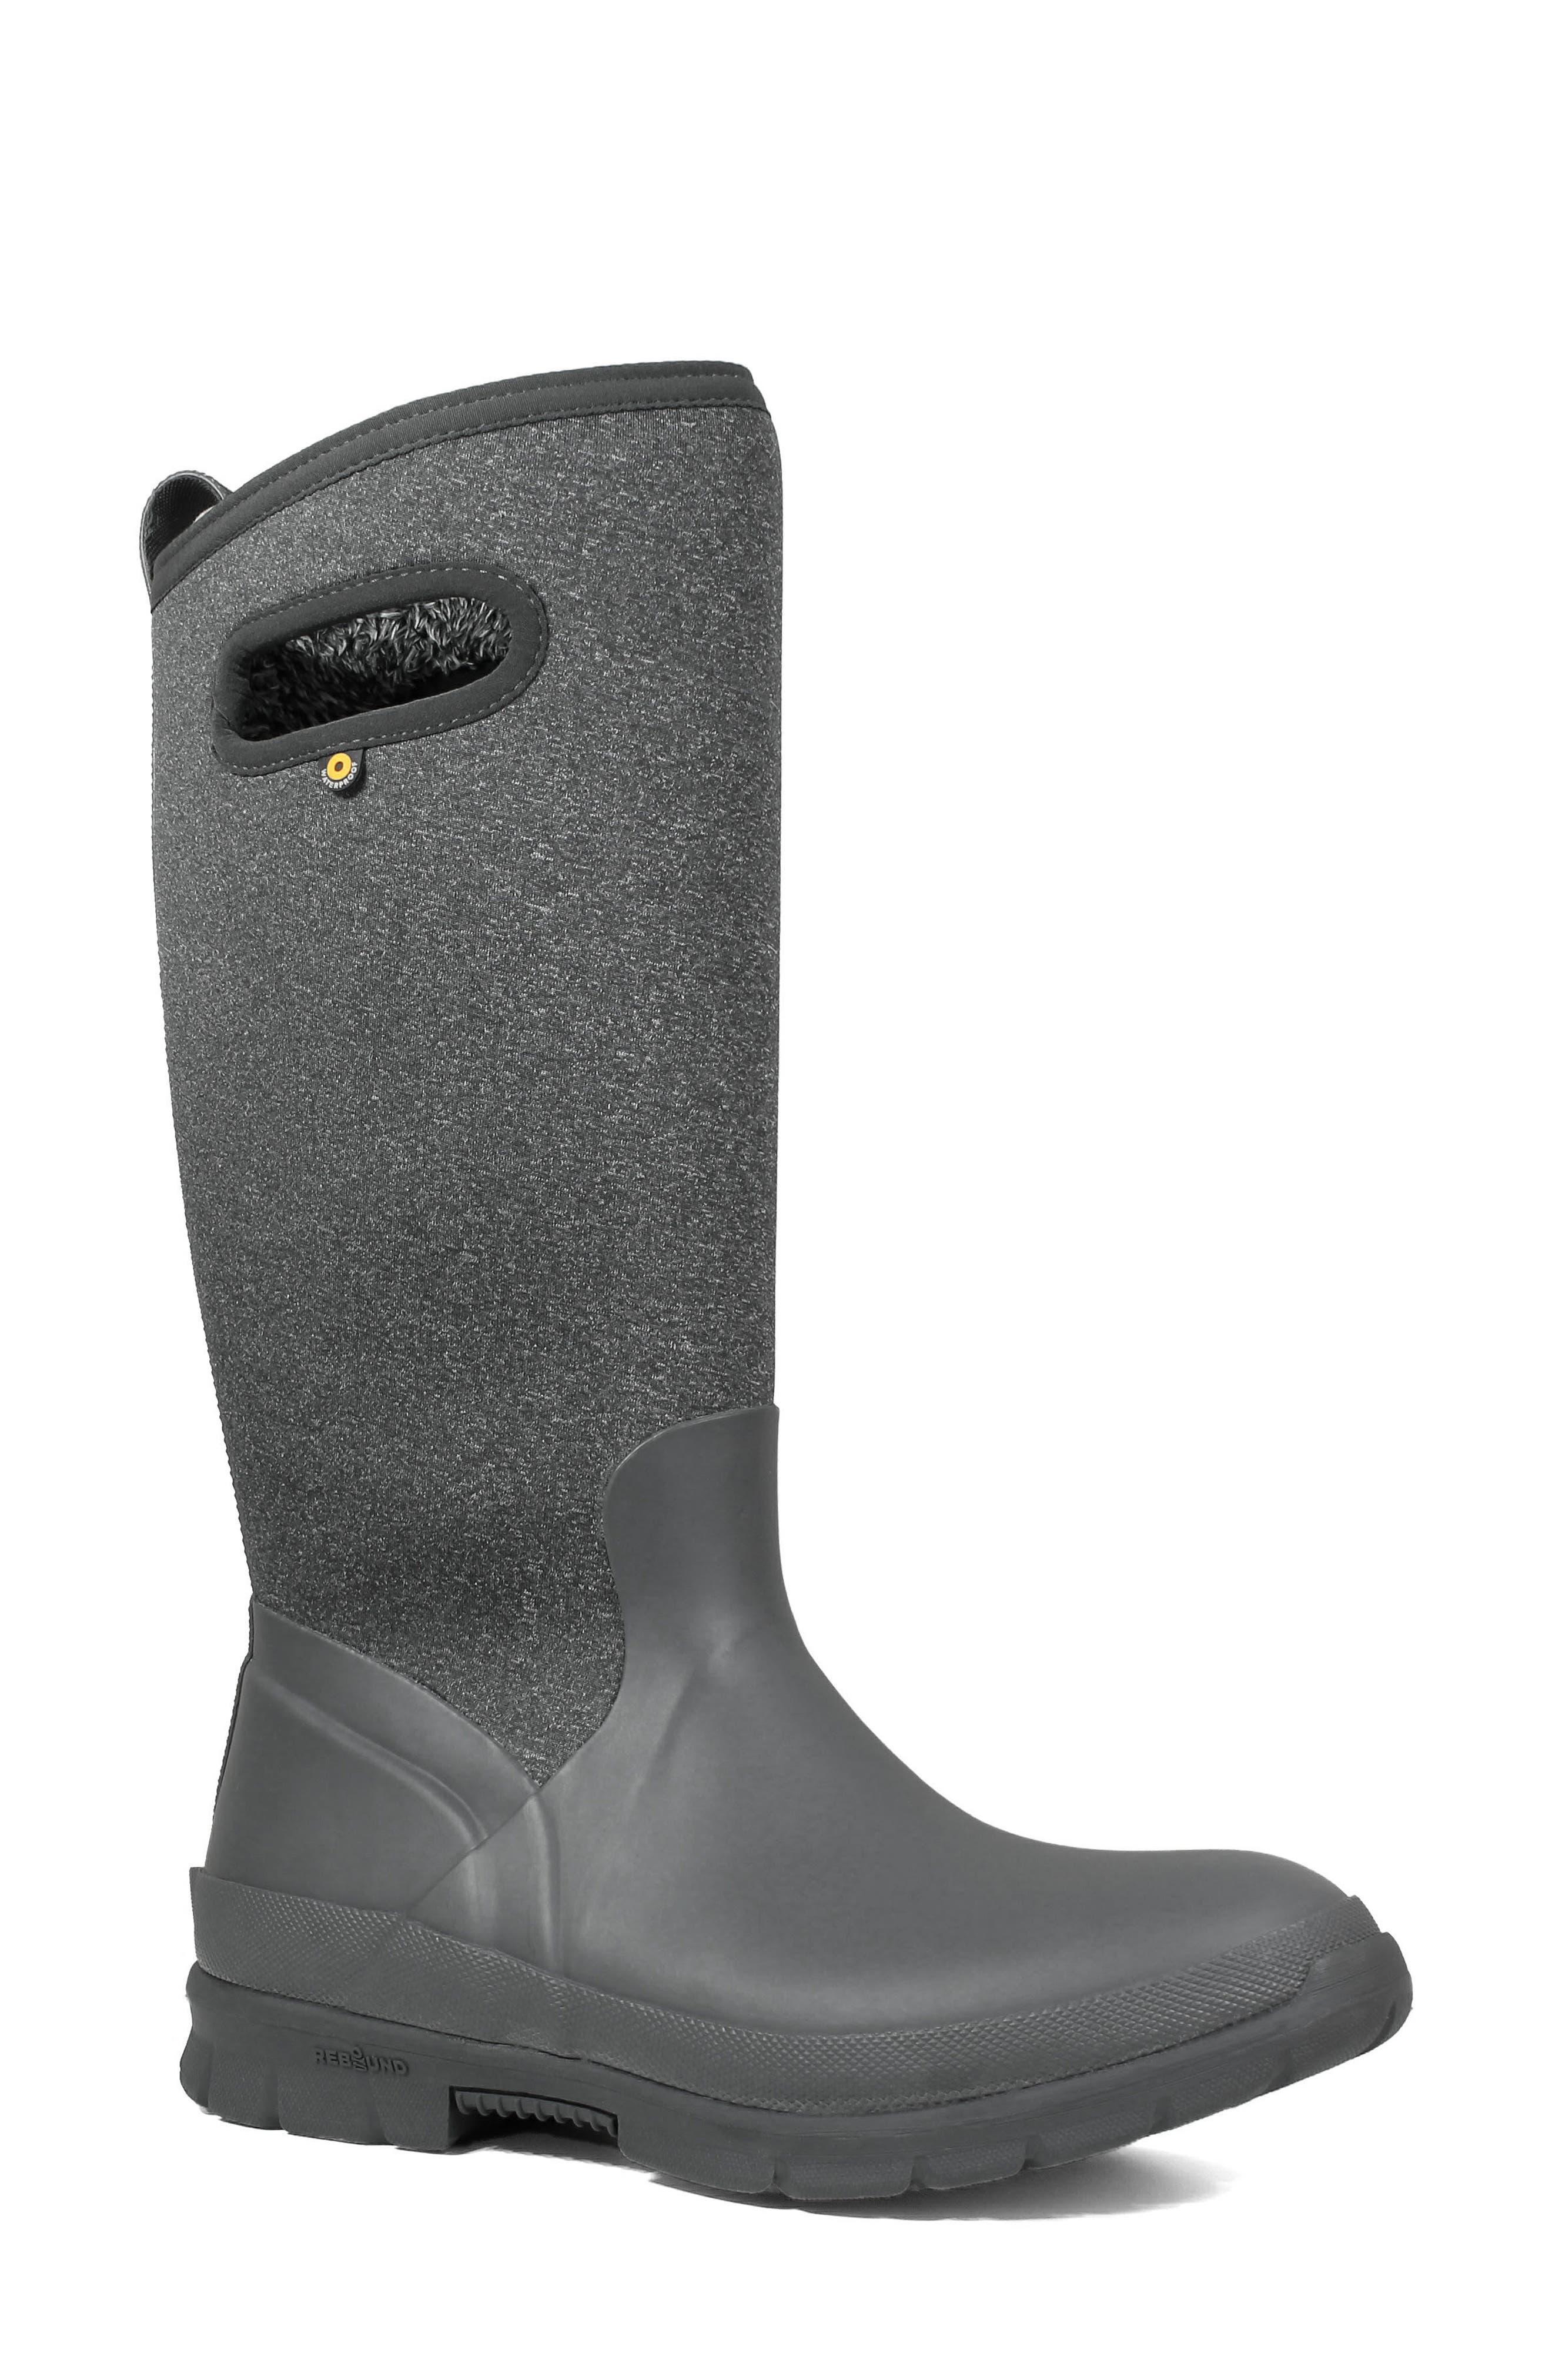 Crandall Waterproof Tall Boot,                             Main thumbnail 1, color,                             DARK GREY